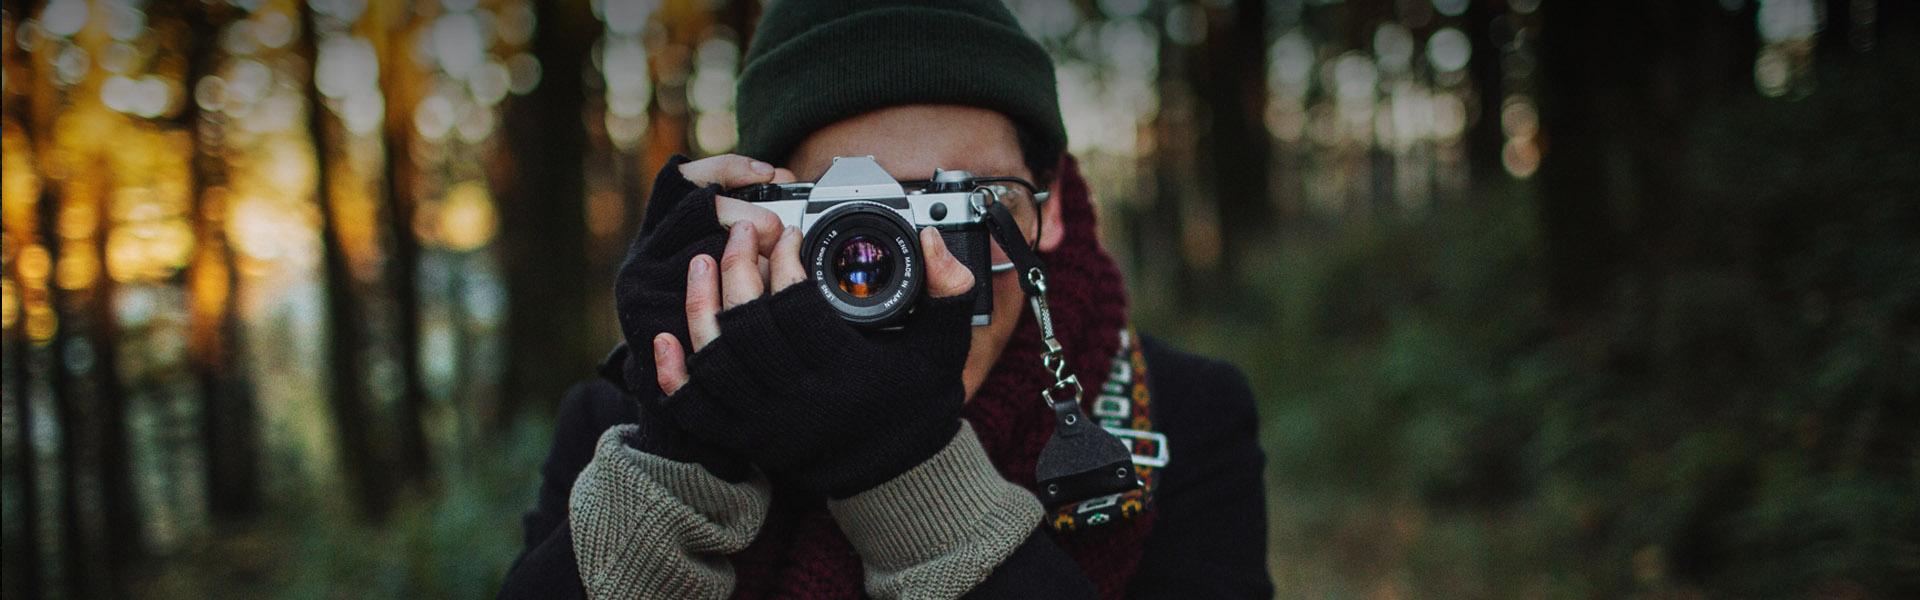 HB_WebSliders_camera